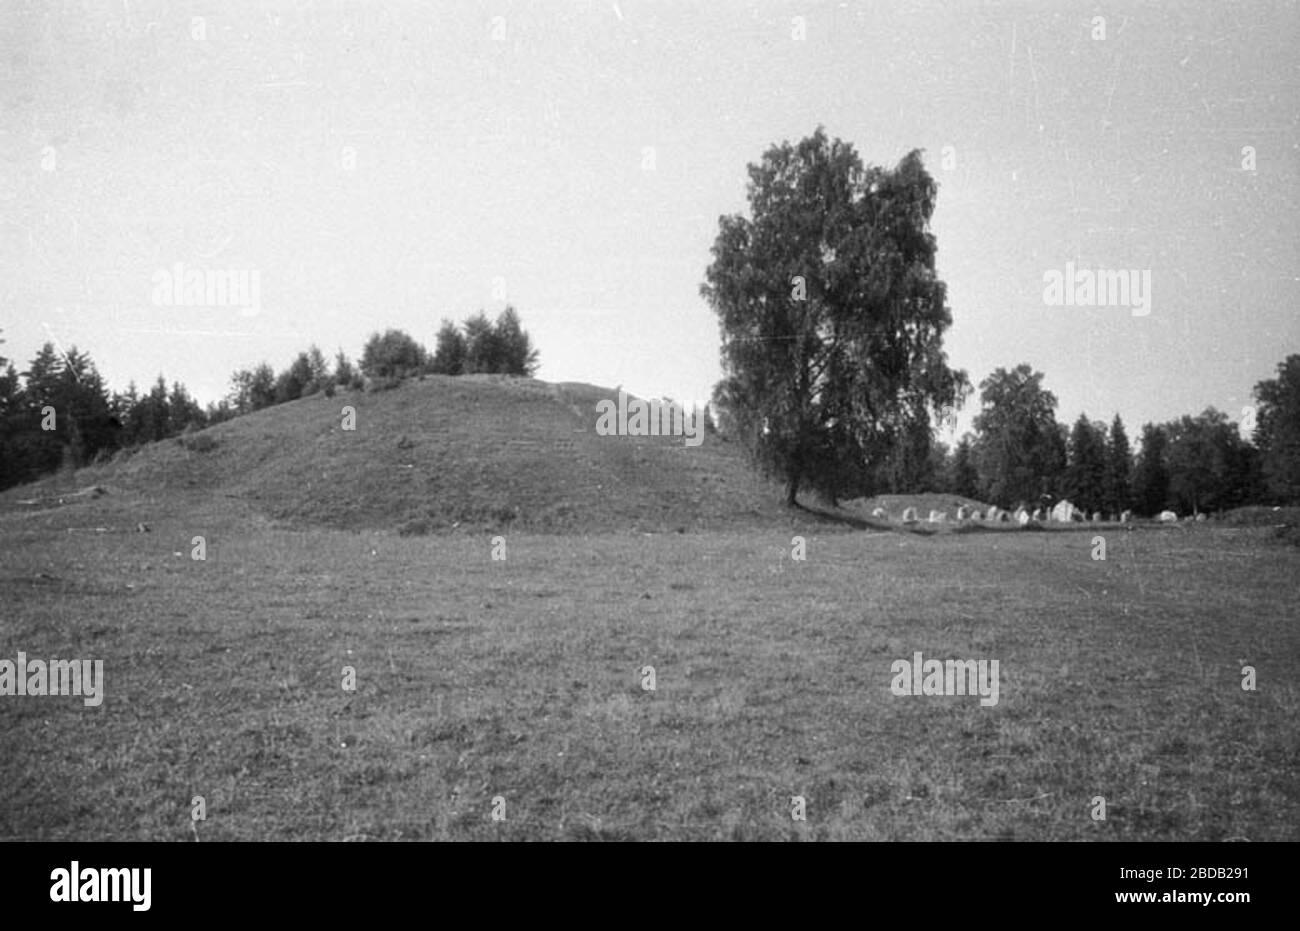 File:Anundstenen Vs13 i Badelunda (Peringskild 1725 s015